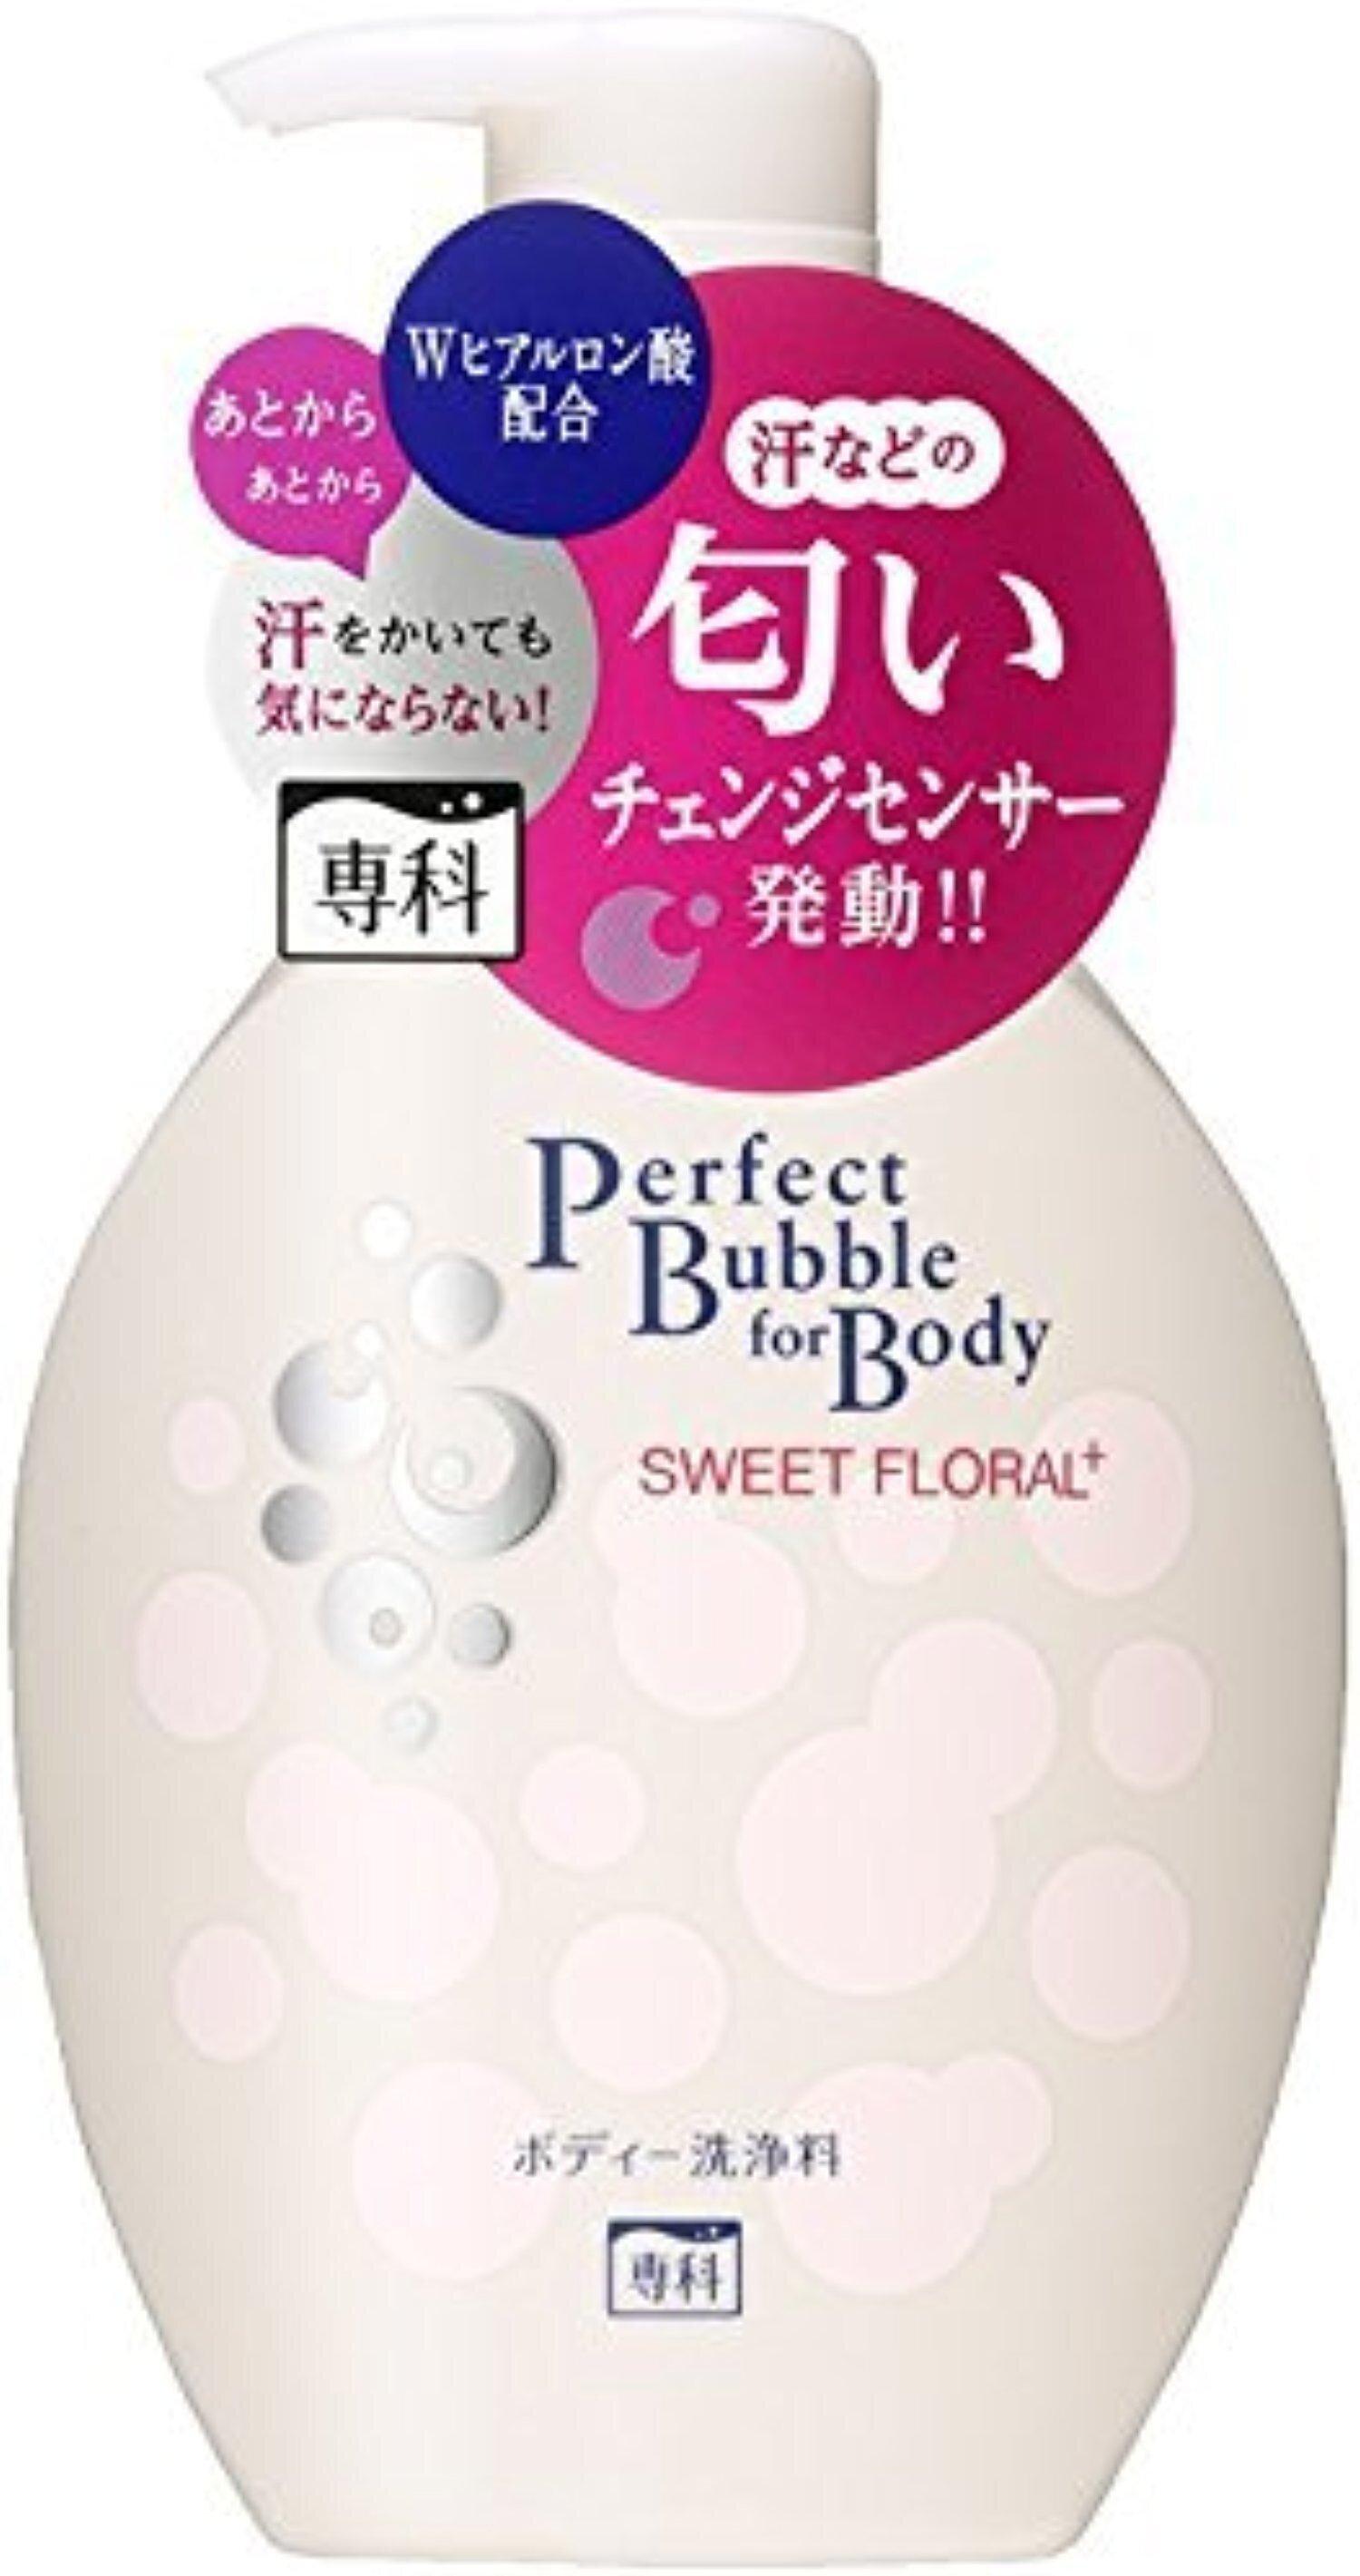 Sữa tắm Shiseido Perfect Bubble 500ml